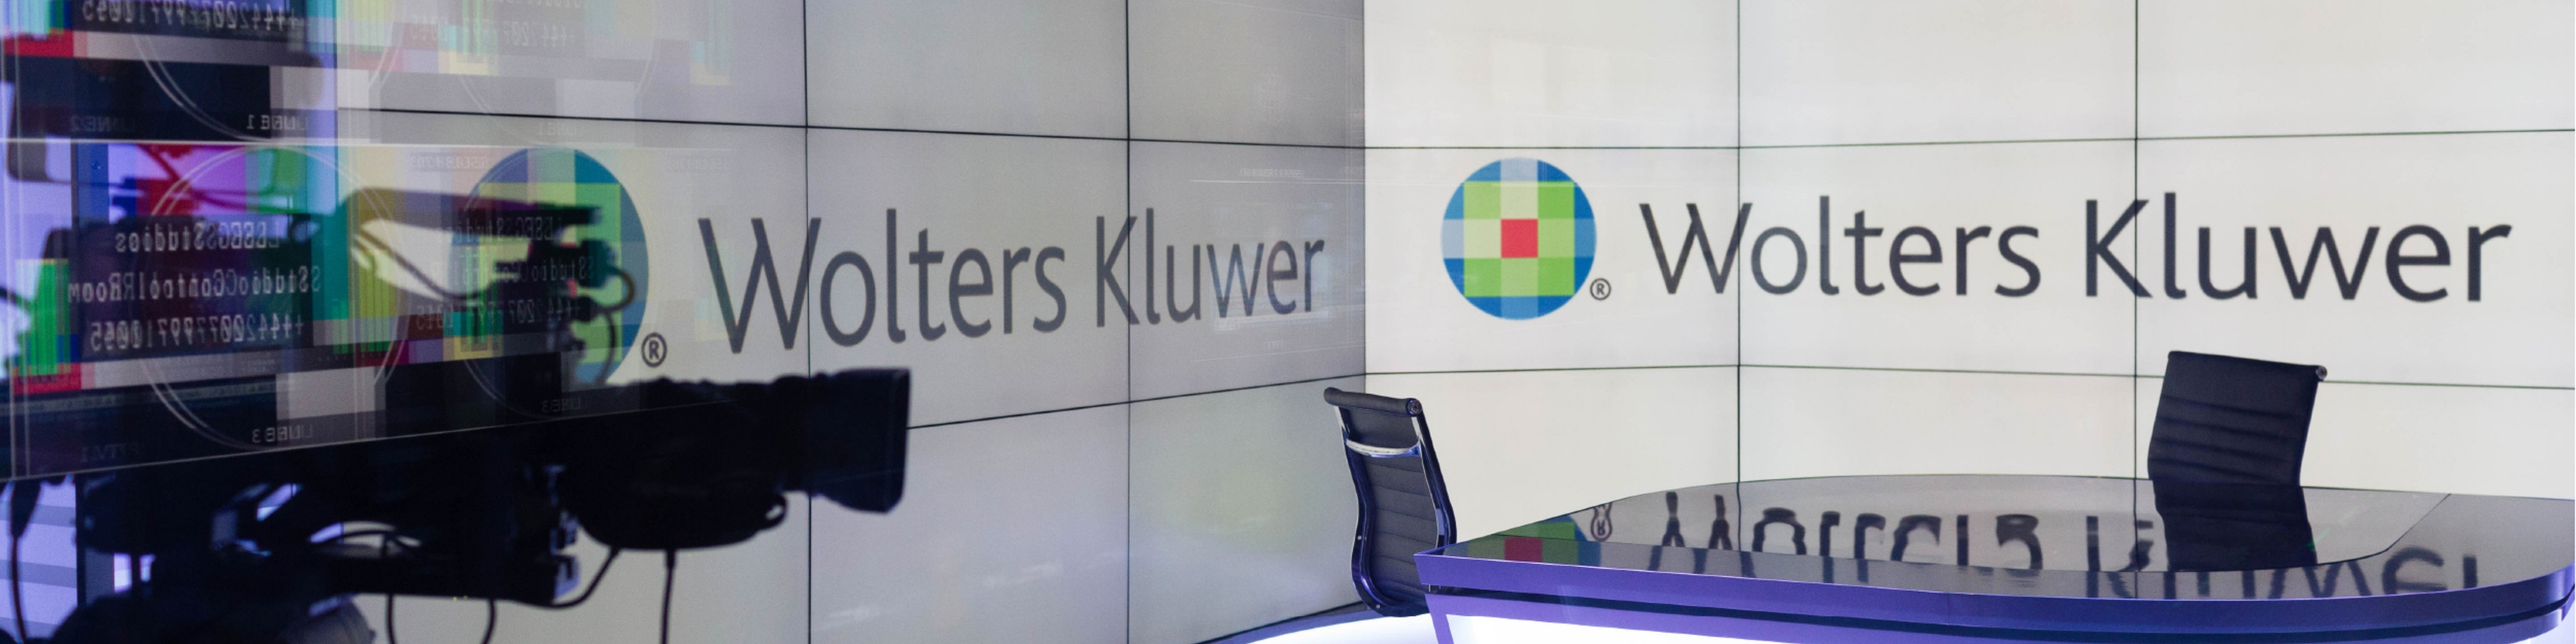 Wolters Kluwer studio hero image